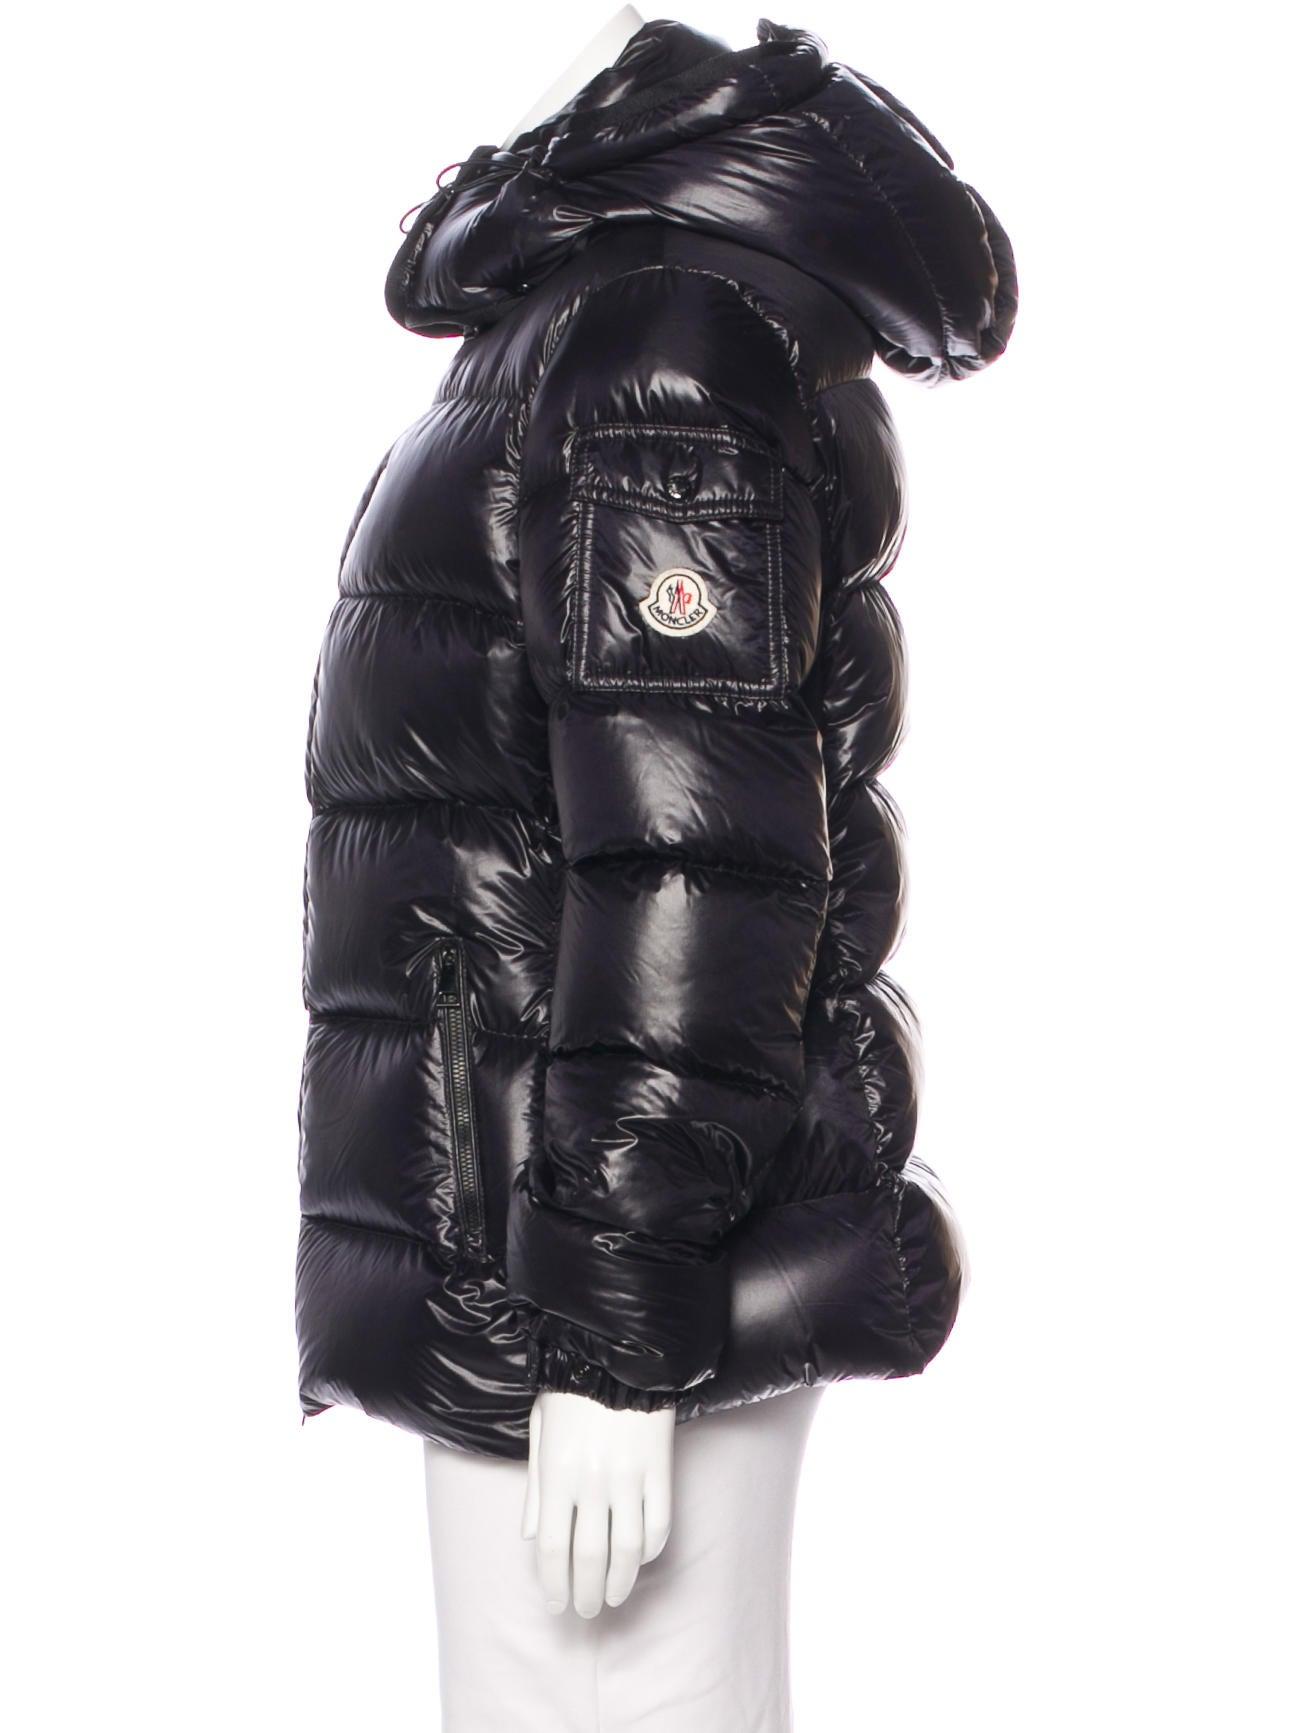 Moncler Berre Puffer Jacket - Clothing